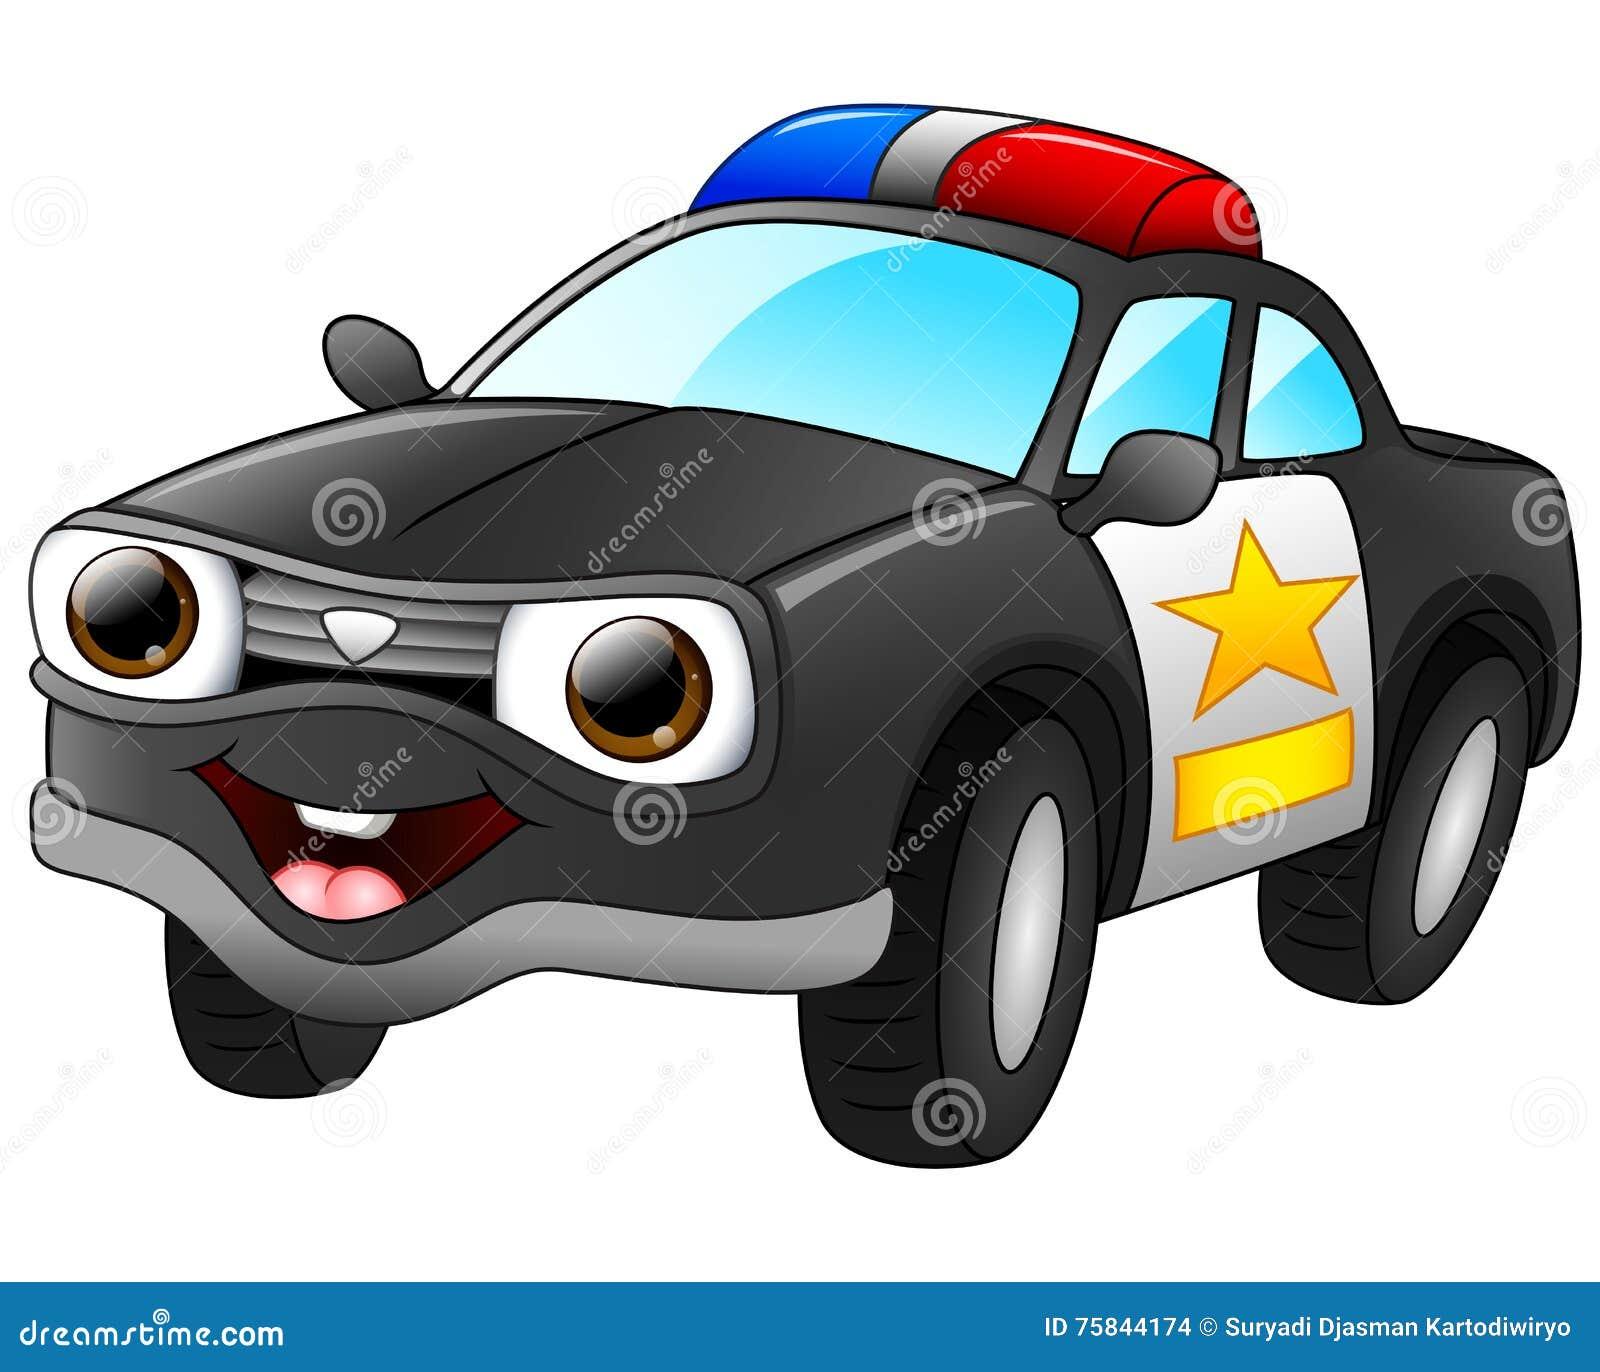 Police Car Cartoon Stock Illustrations